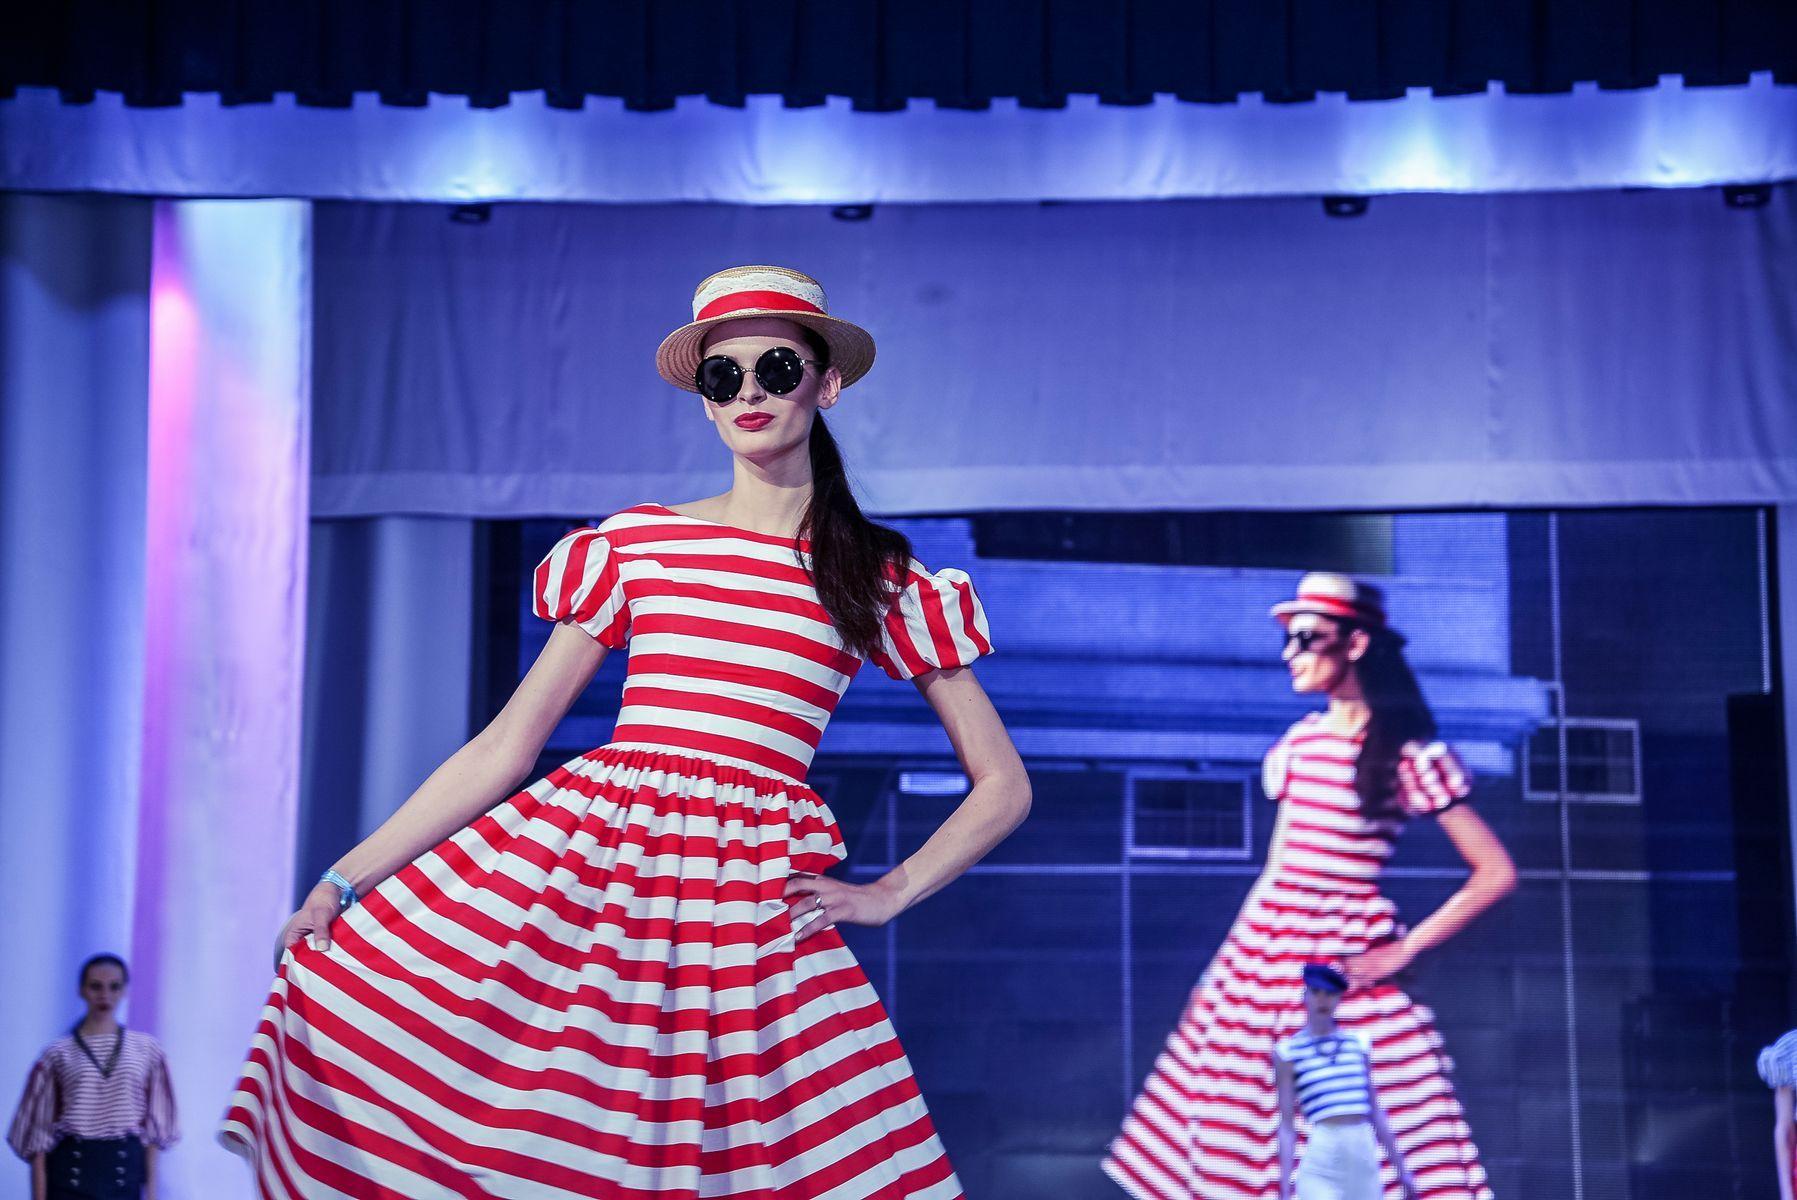 Неделя моды во ВГУЭС: коллекции и тенденции, новички и гуру фешн-индустрии стран АТР